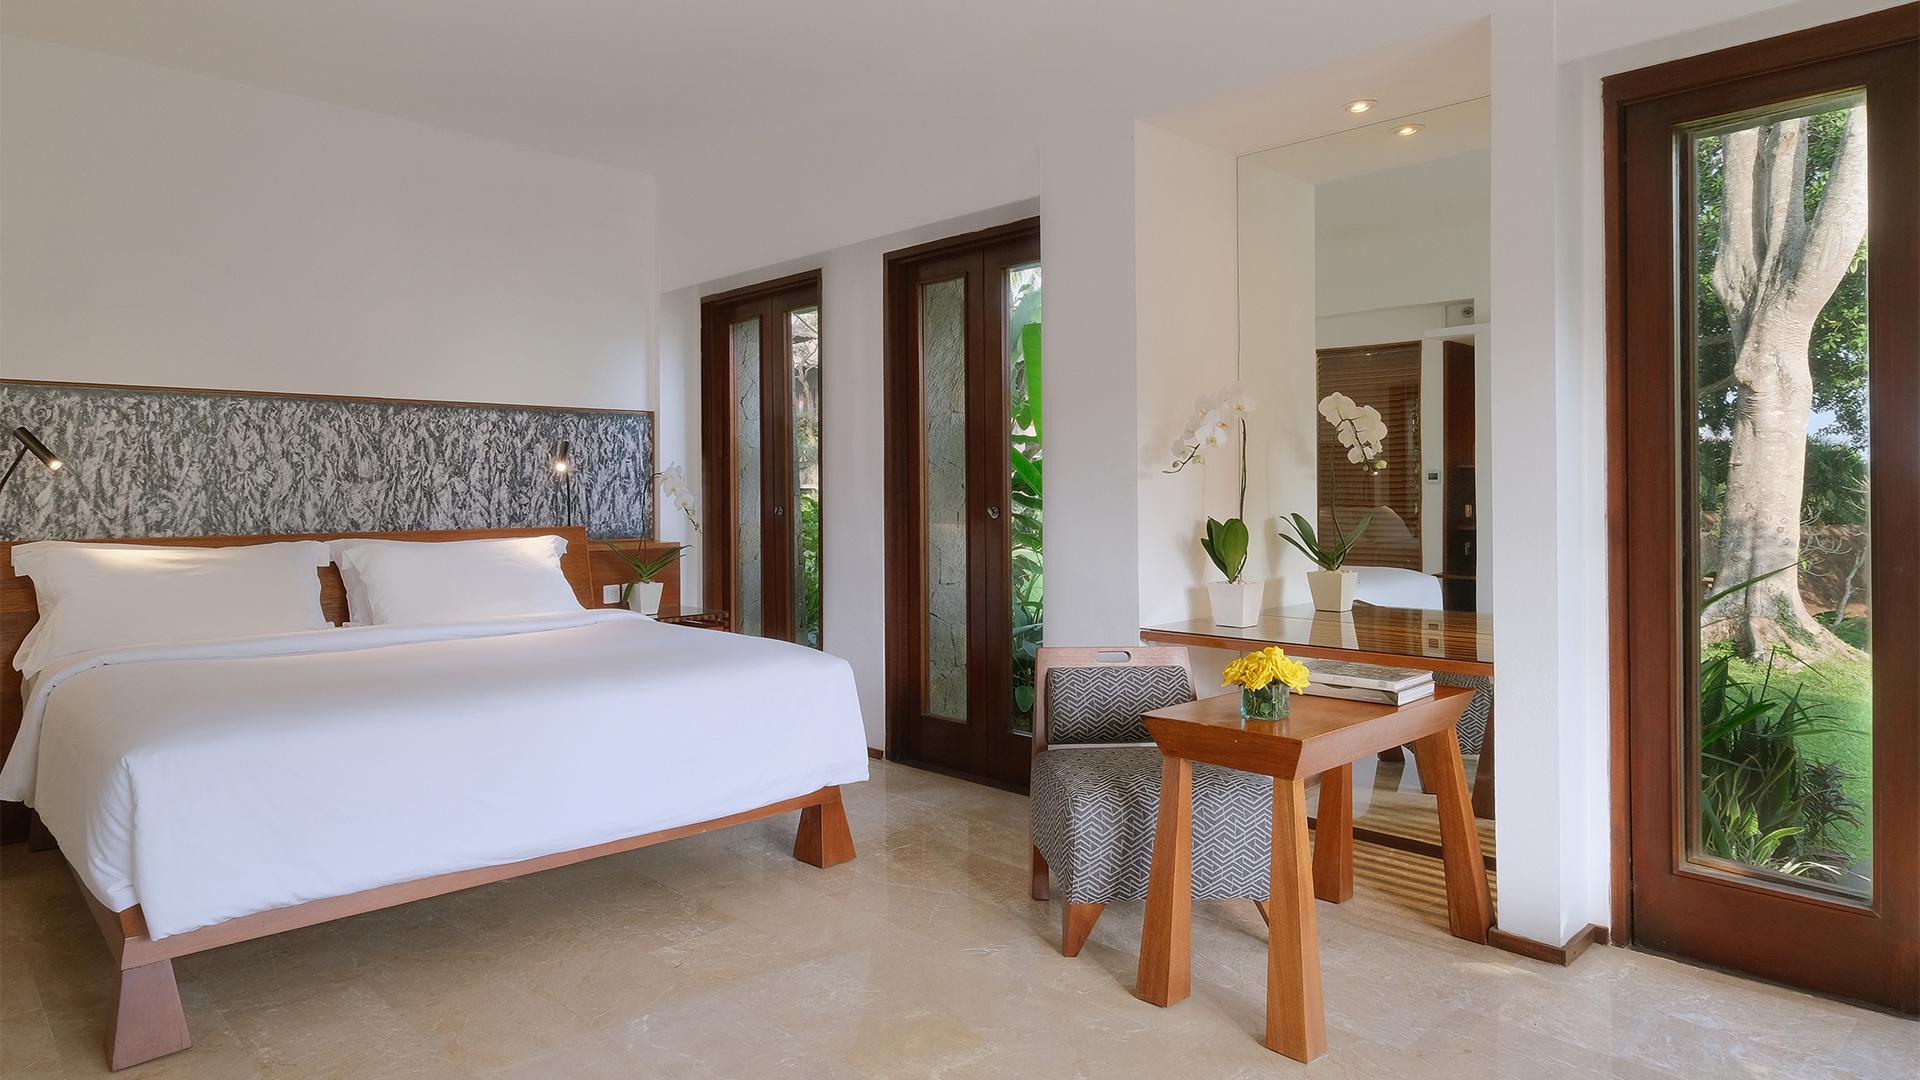 Impressive Forest Suite image 1 at Maya Ubud Resort & Spa by Kabupaten Gianyar, Bali, Indonesia